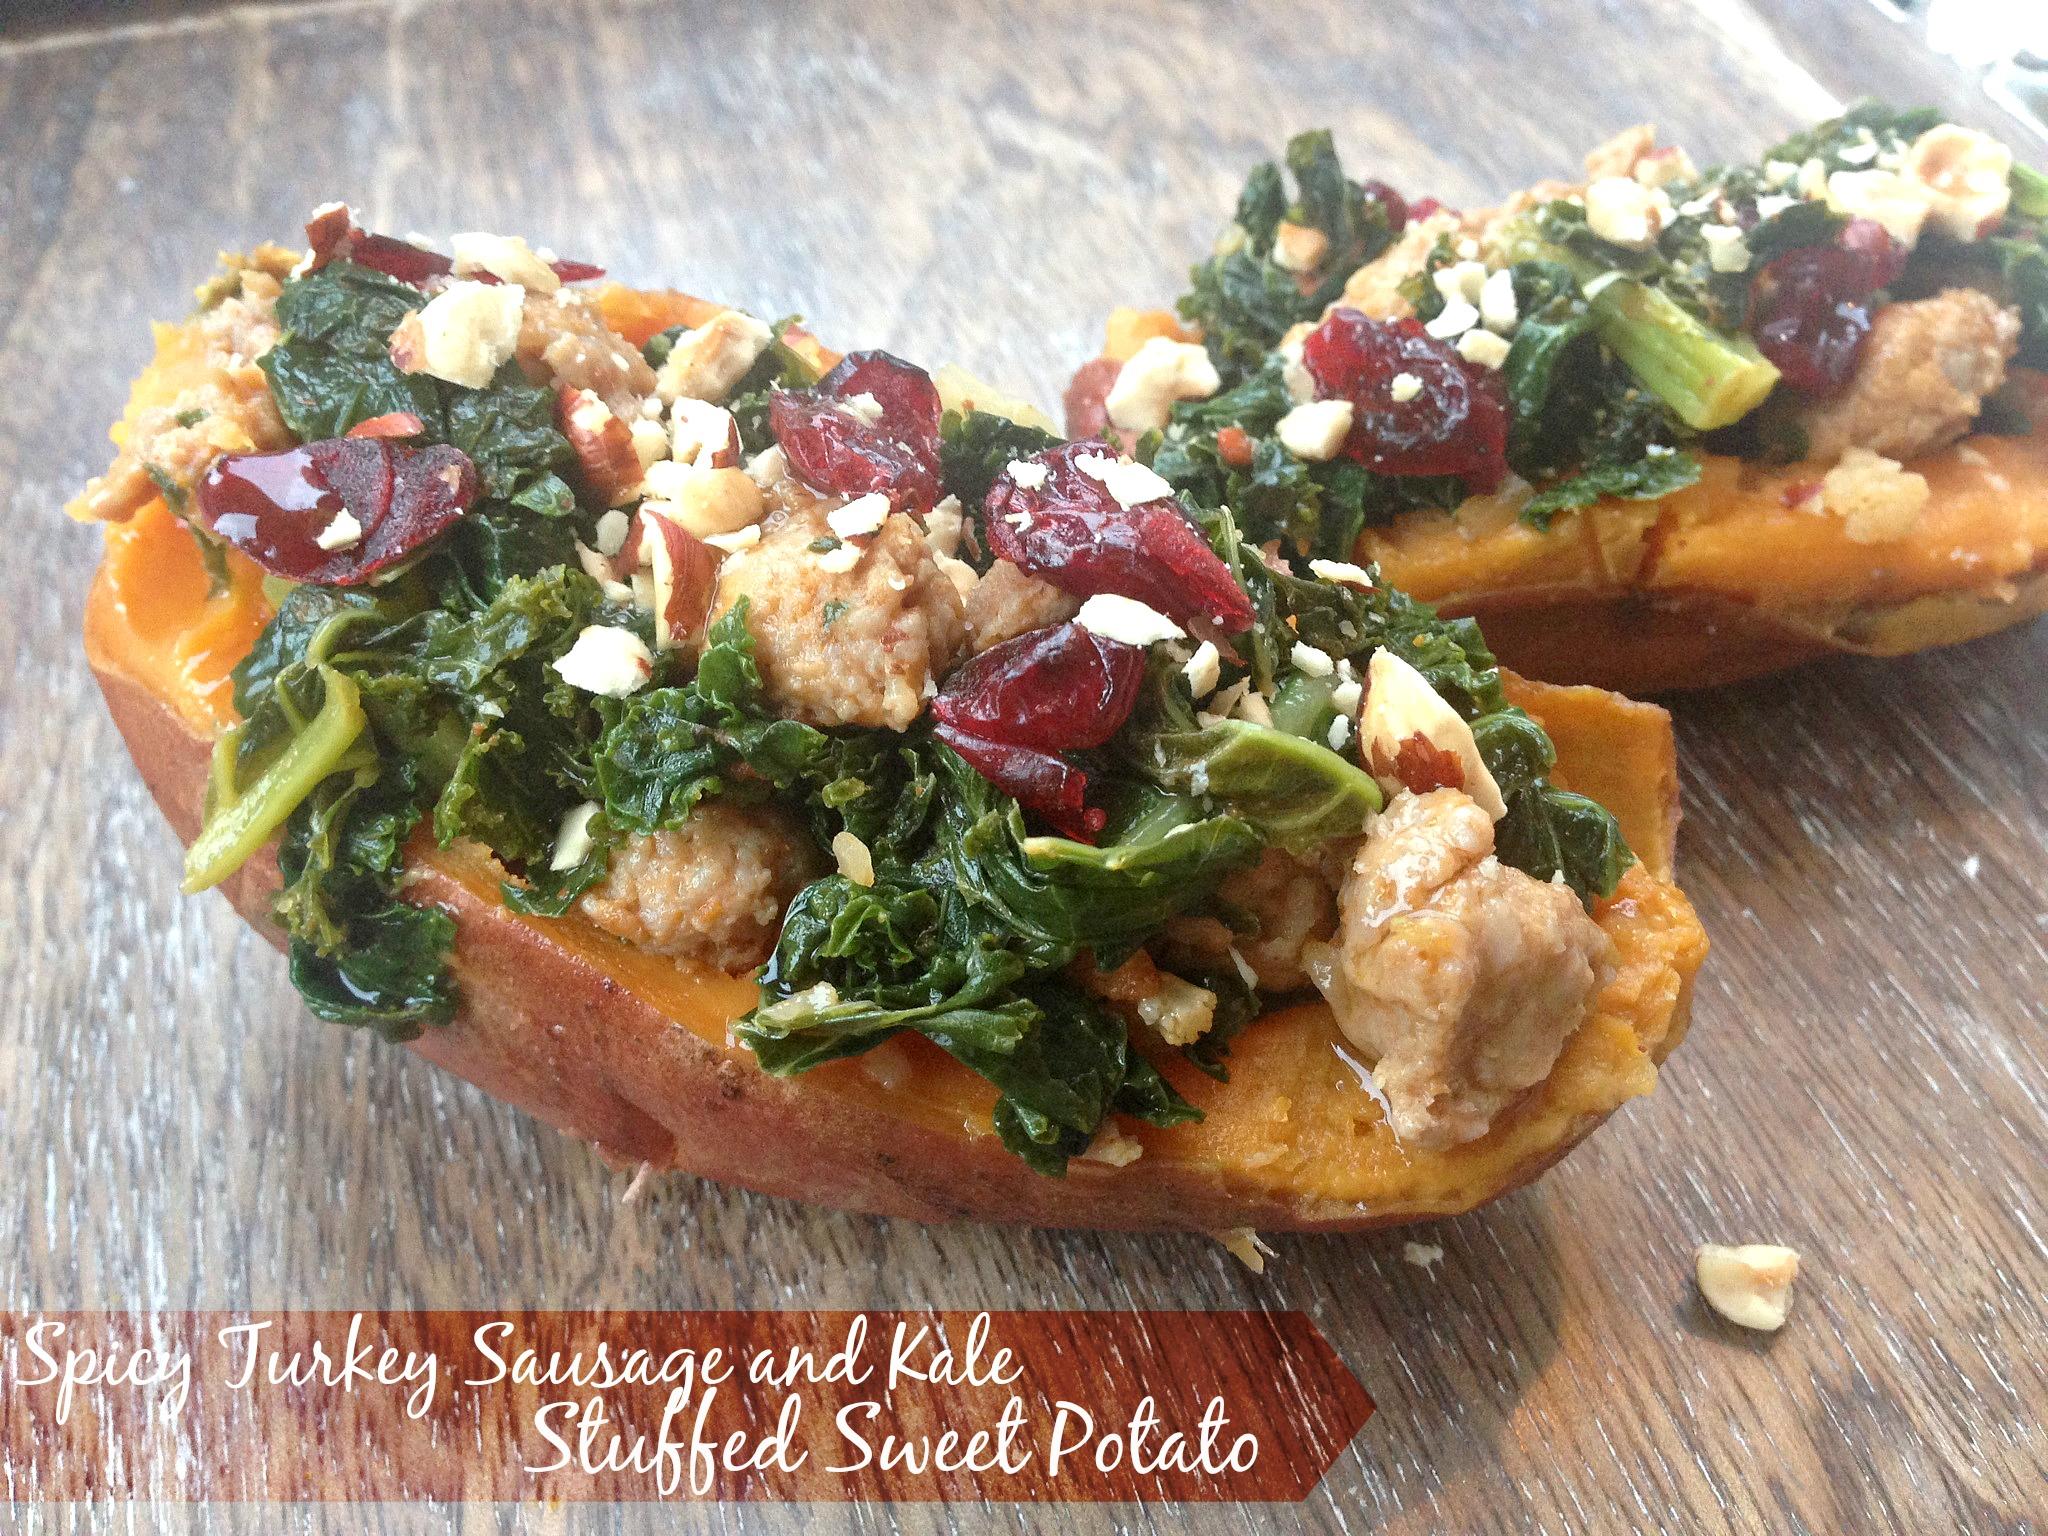 Spicy Turkey Sausage and Kale Stuffed Sweet Potatoes